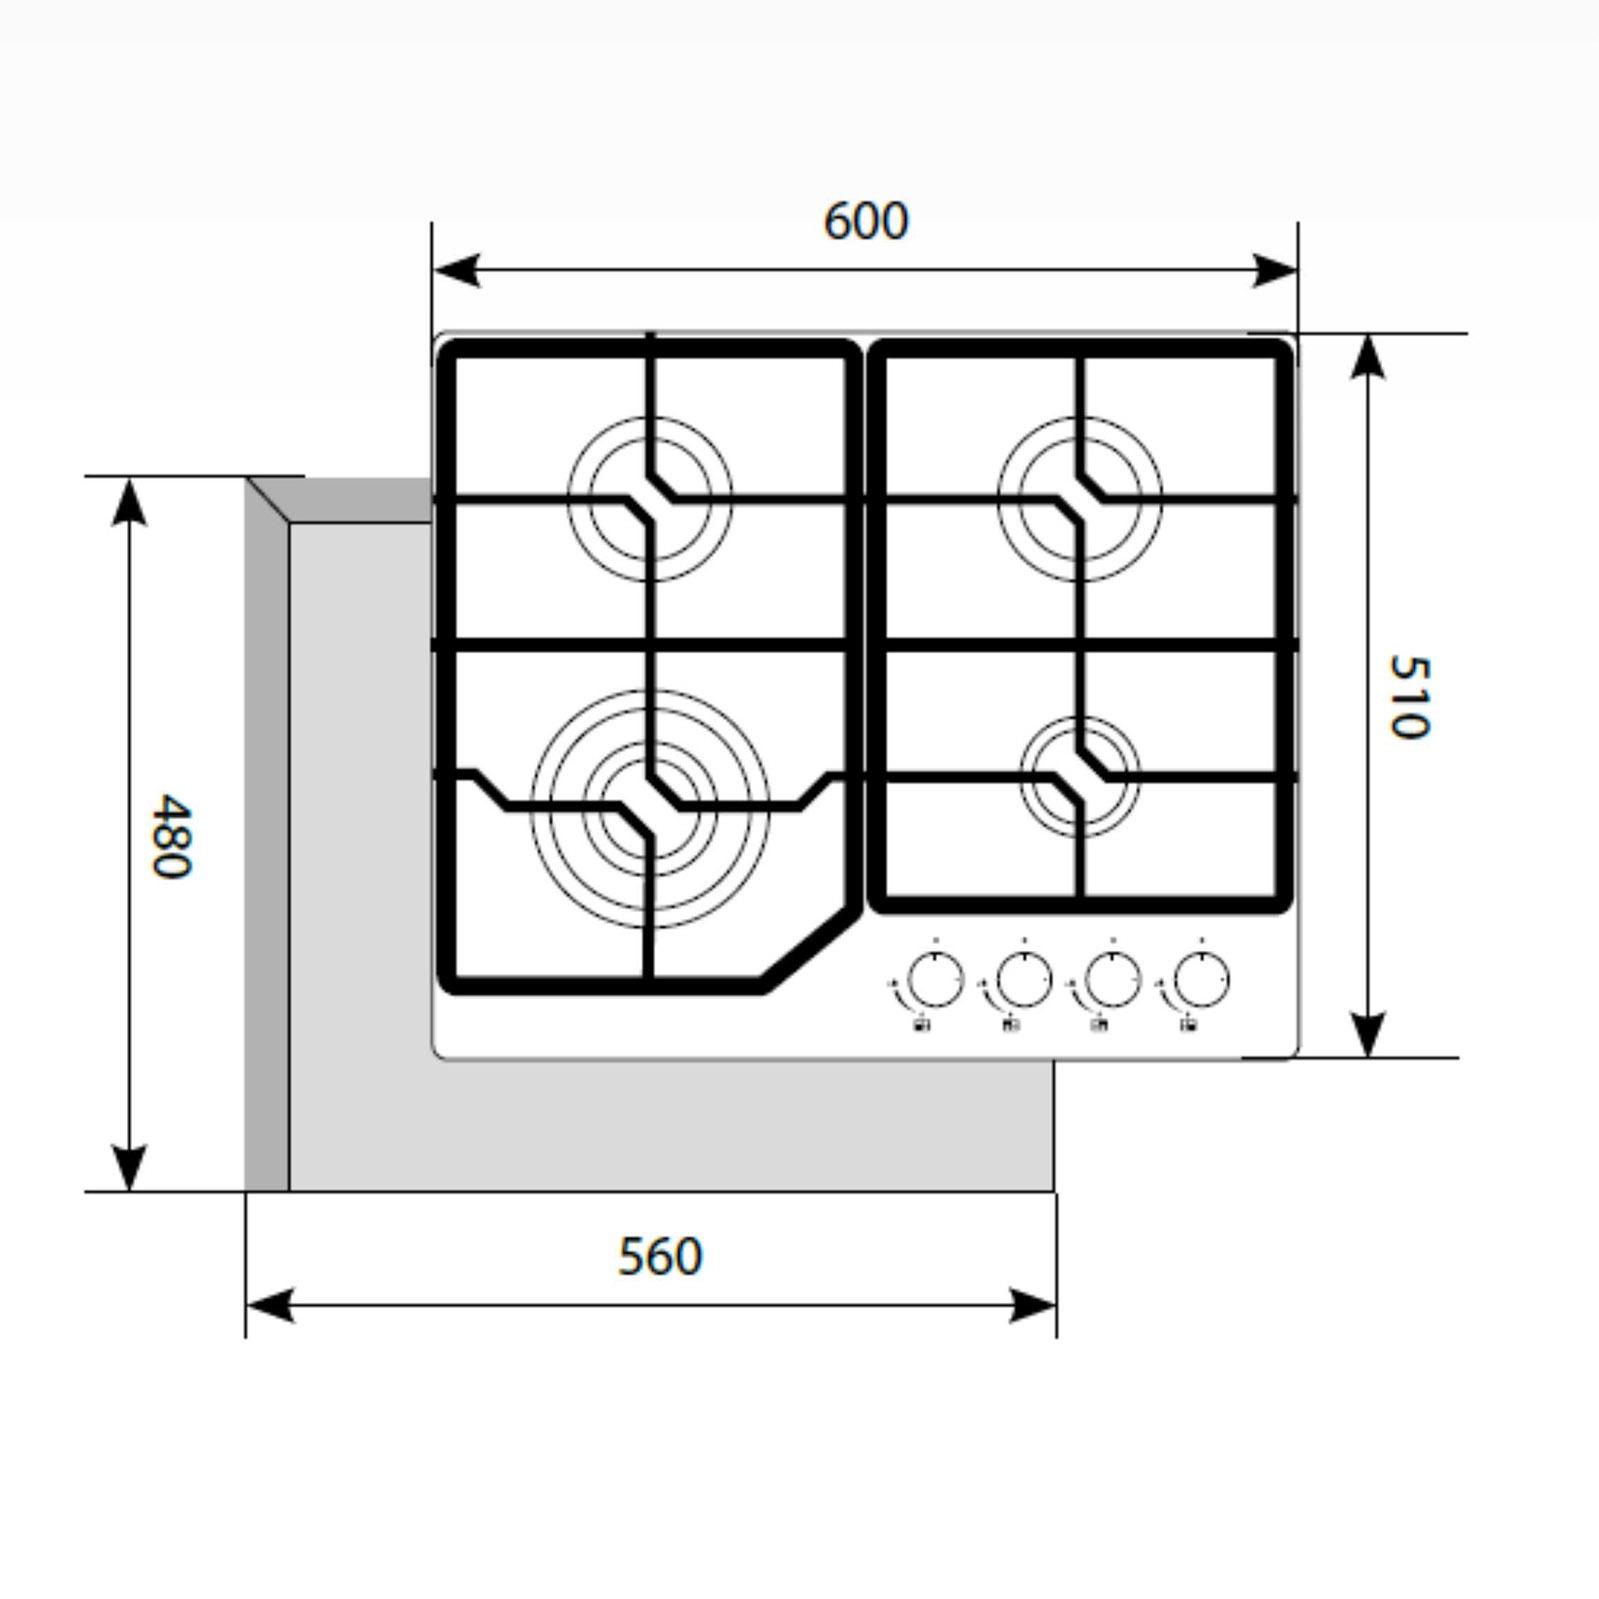 Варочная панель Lex GVG 640-1 BL, черный LEX